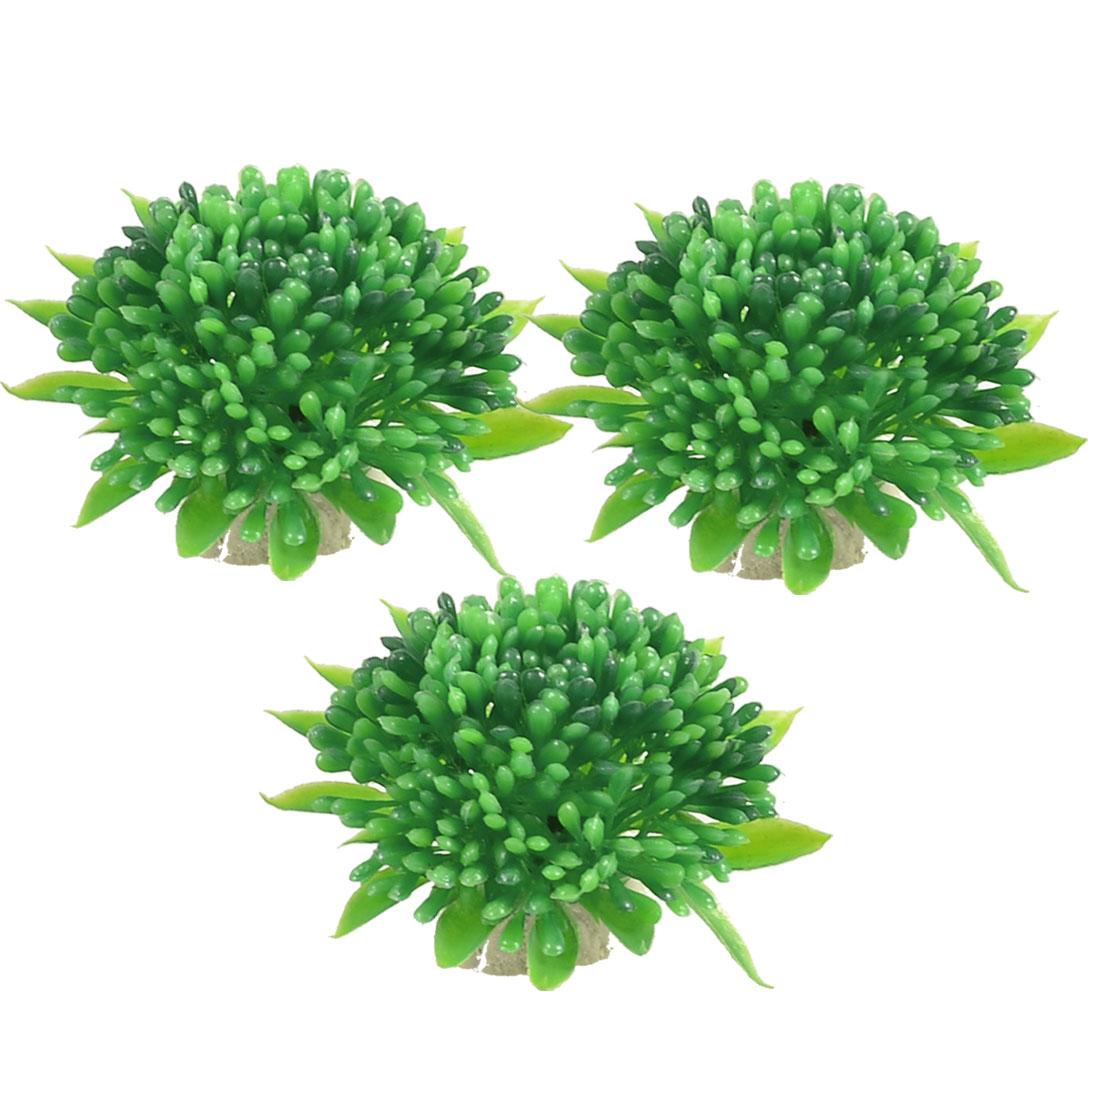 3 Pcs Green Lifelike Aquarium Plastic Plant Flower Decoration